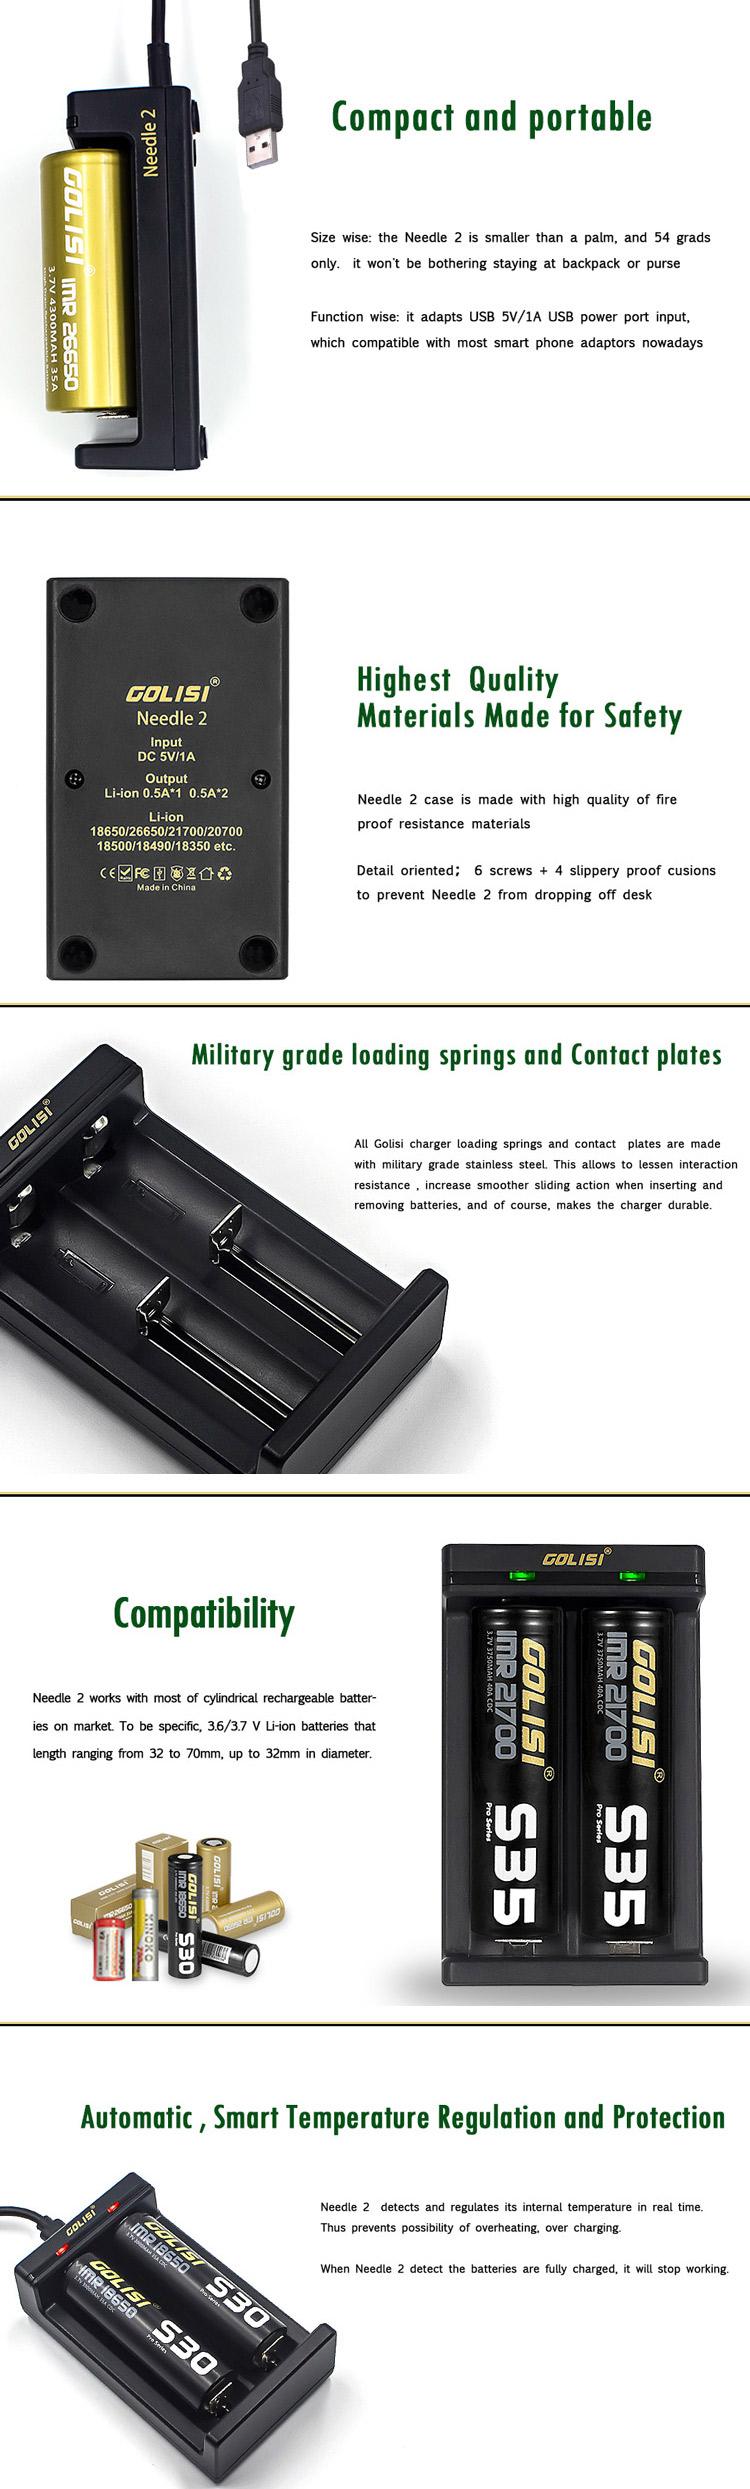 Golisi Needle2 Intelligent USB Charger Feature